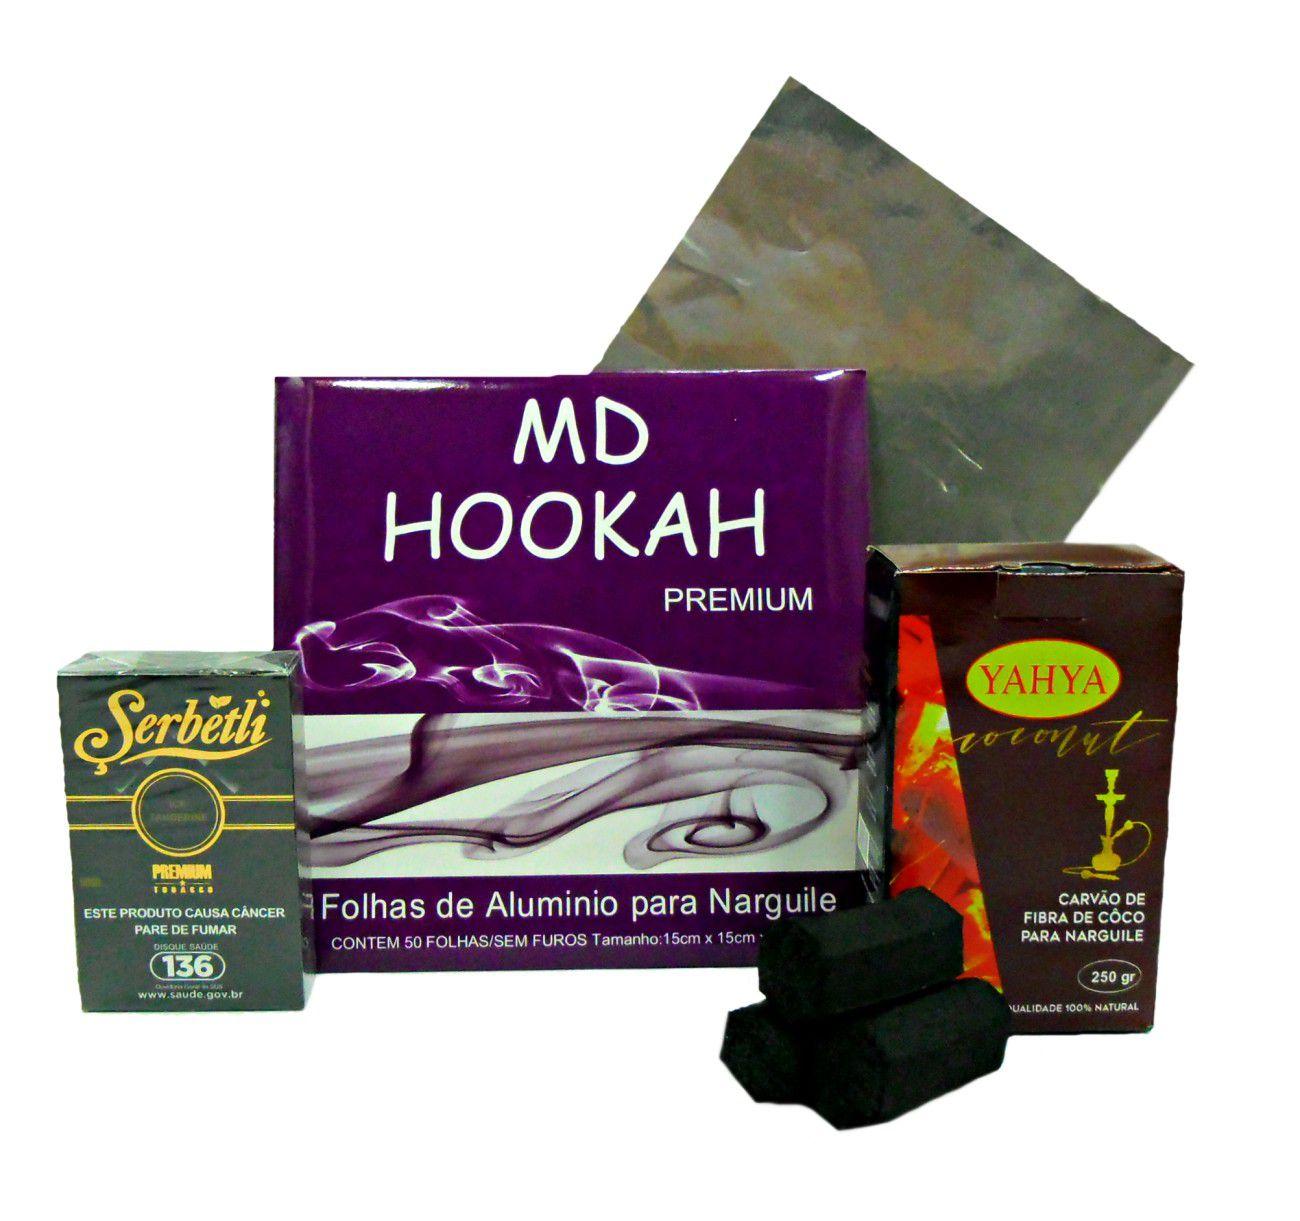 Kit:1 Essência Serbetli 50g (sabor a escolher após a compra) + carvão Yahya 250gr (15un) + alumínio MD c/50